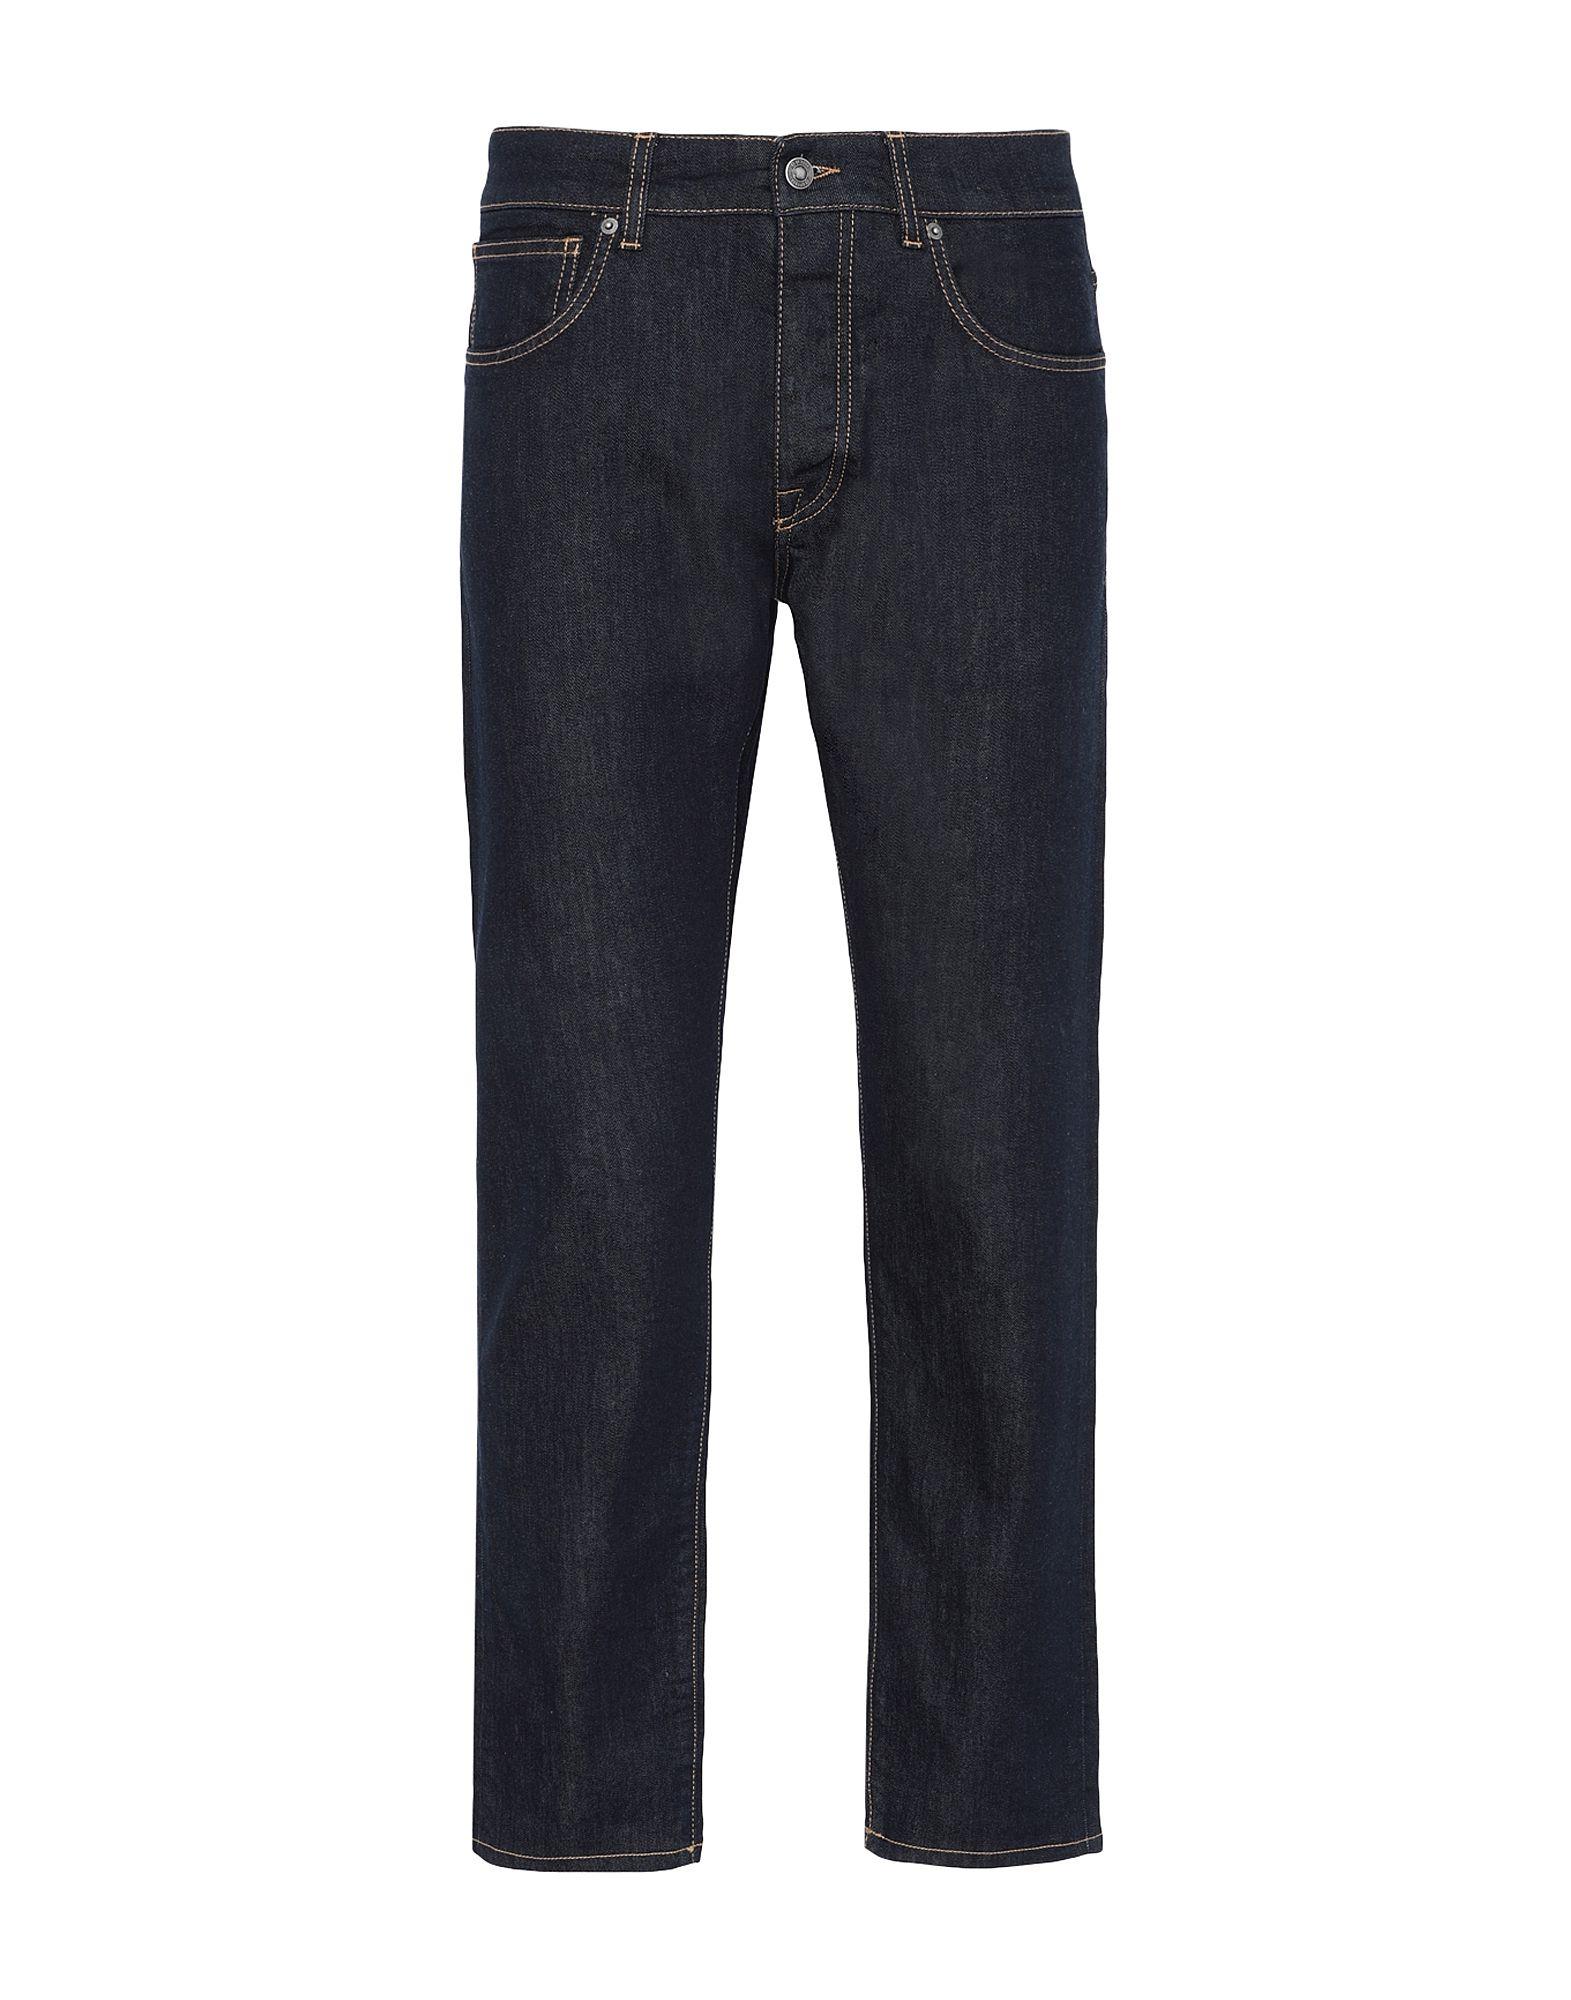 8 by YOOX Denim pants - Item 42759959